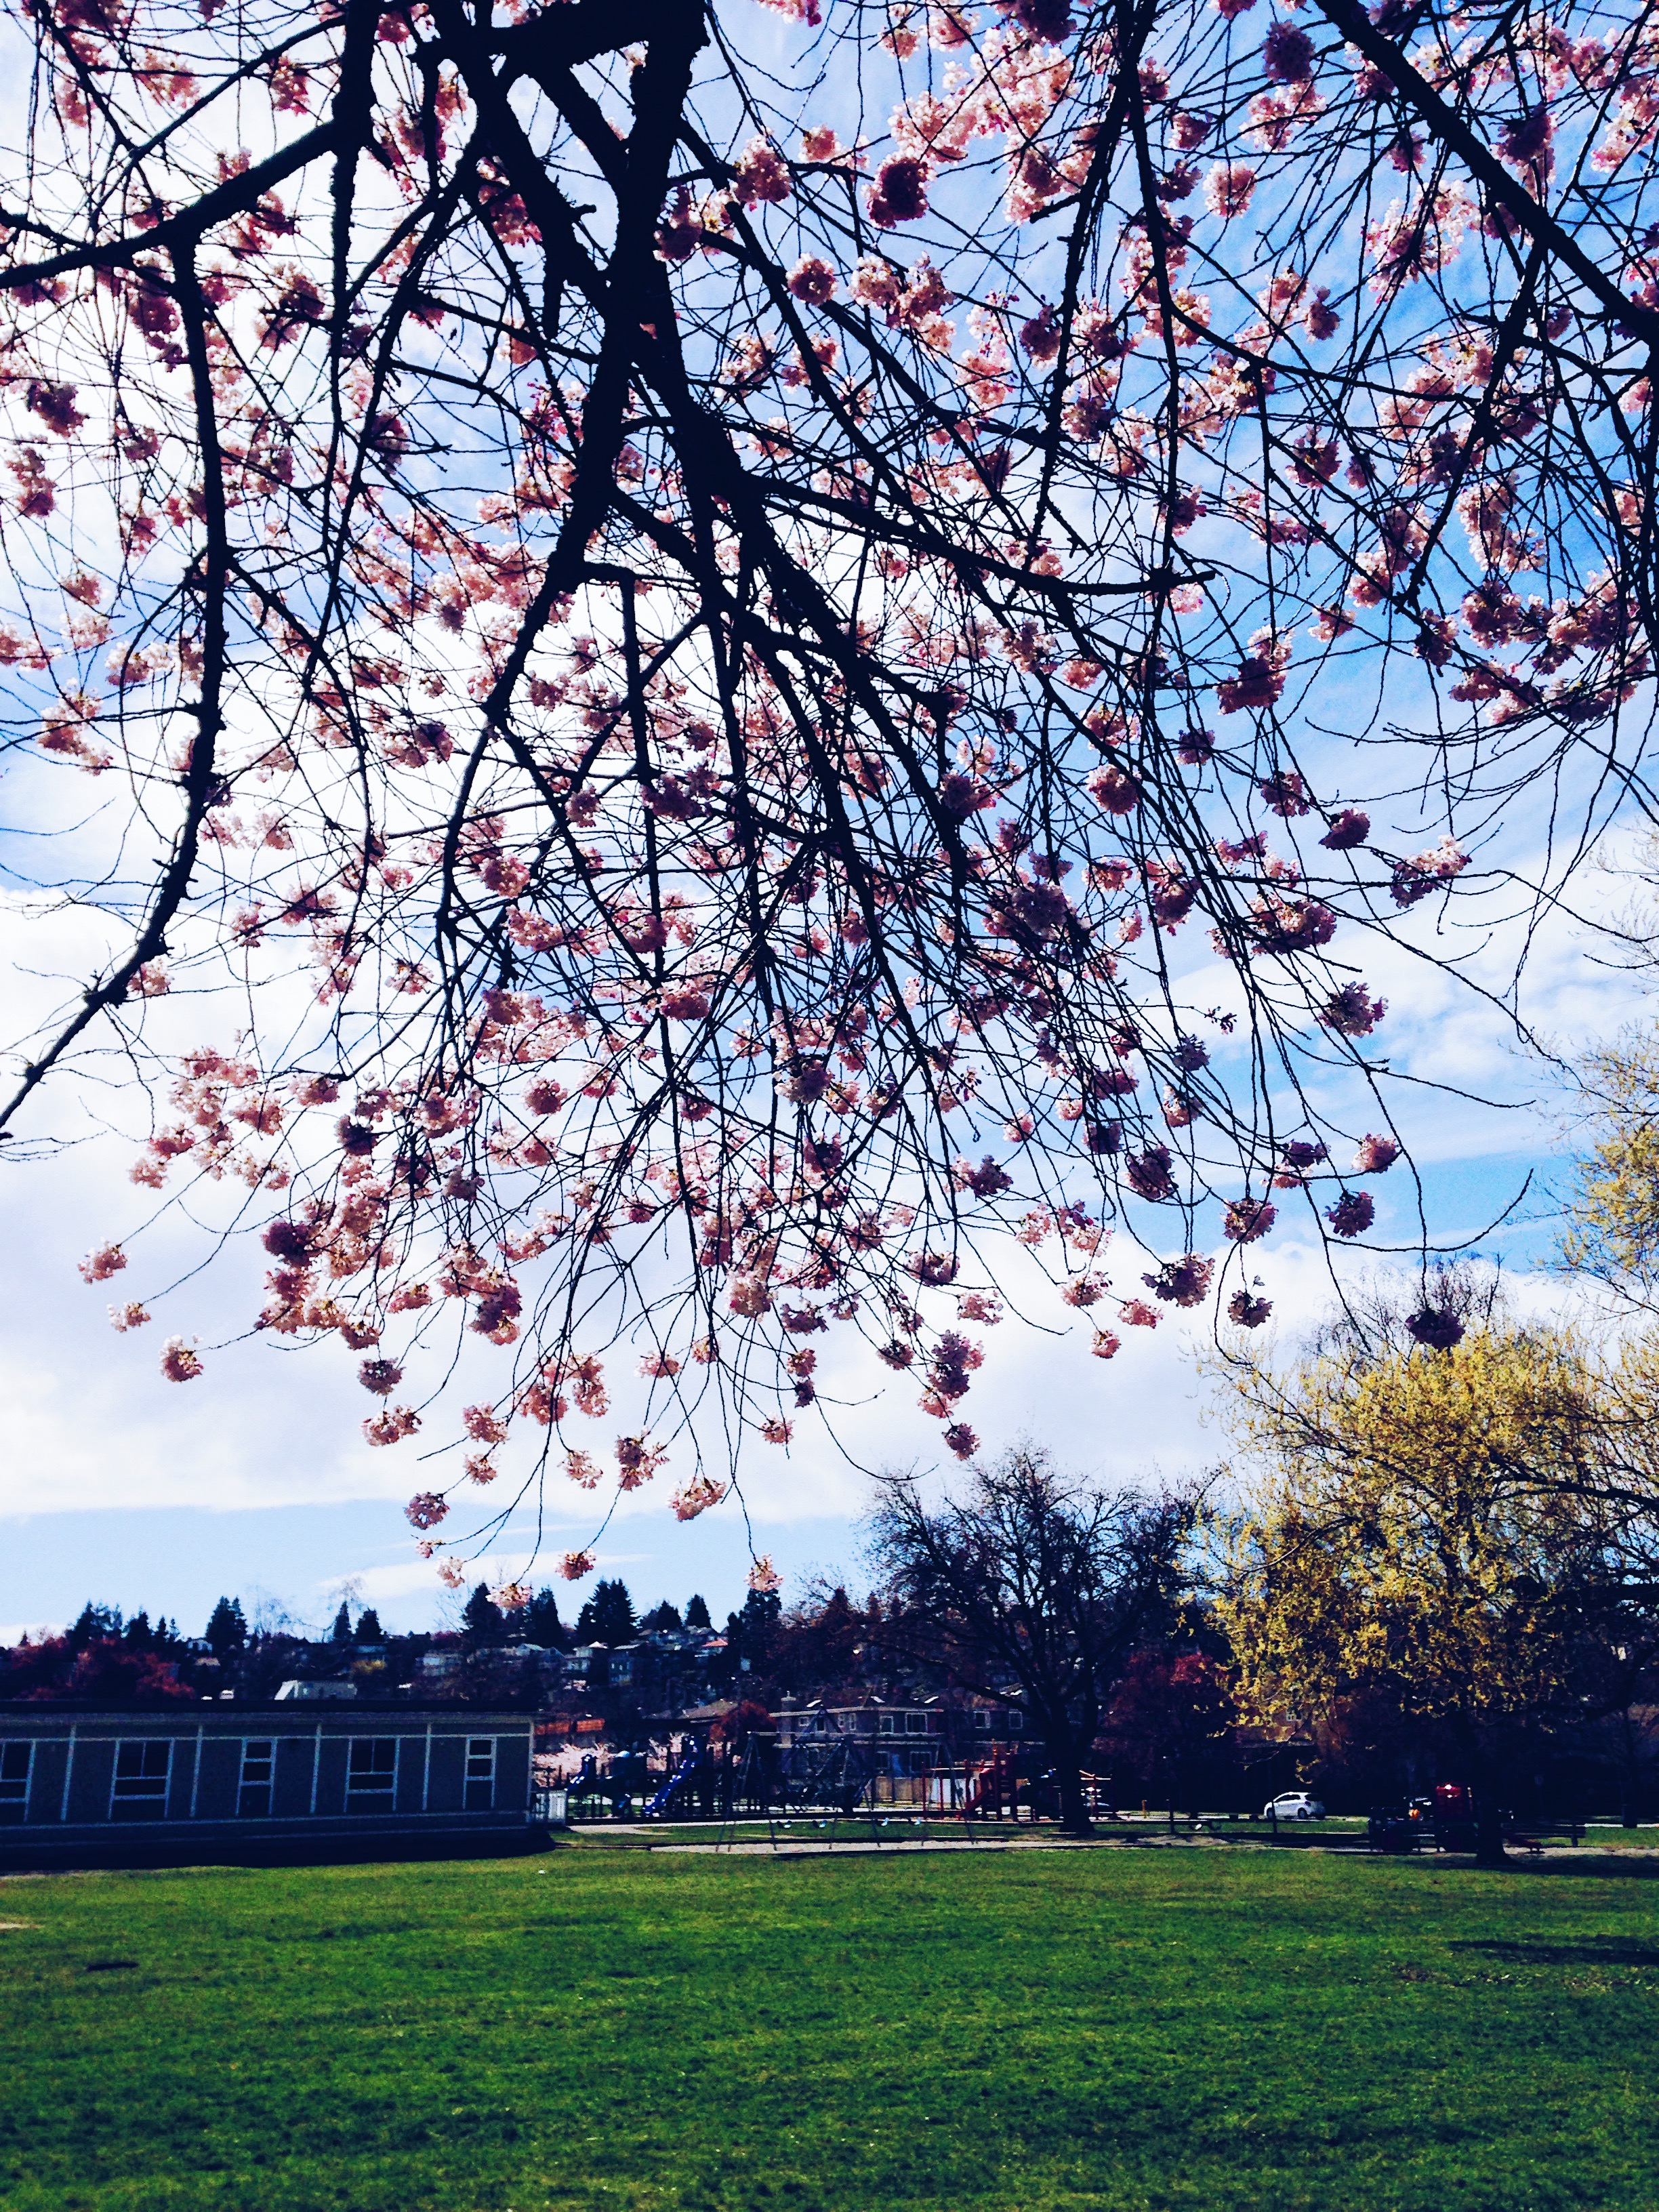 It's Cherry Blossom Season In Vancouver Again